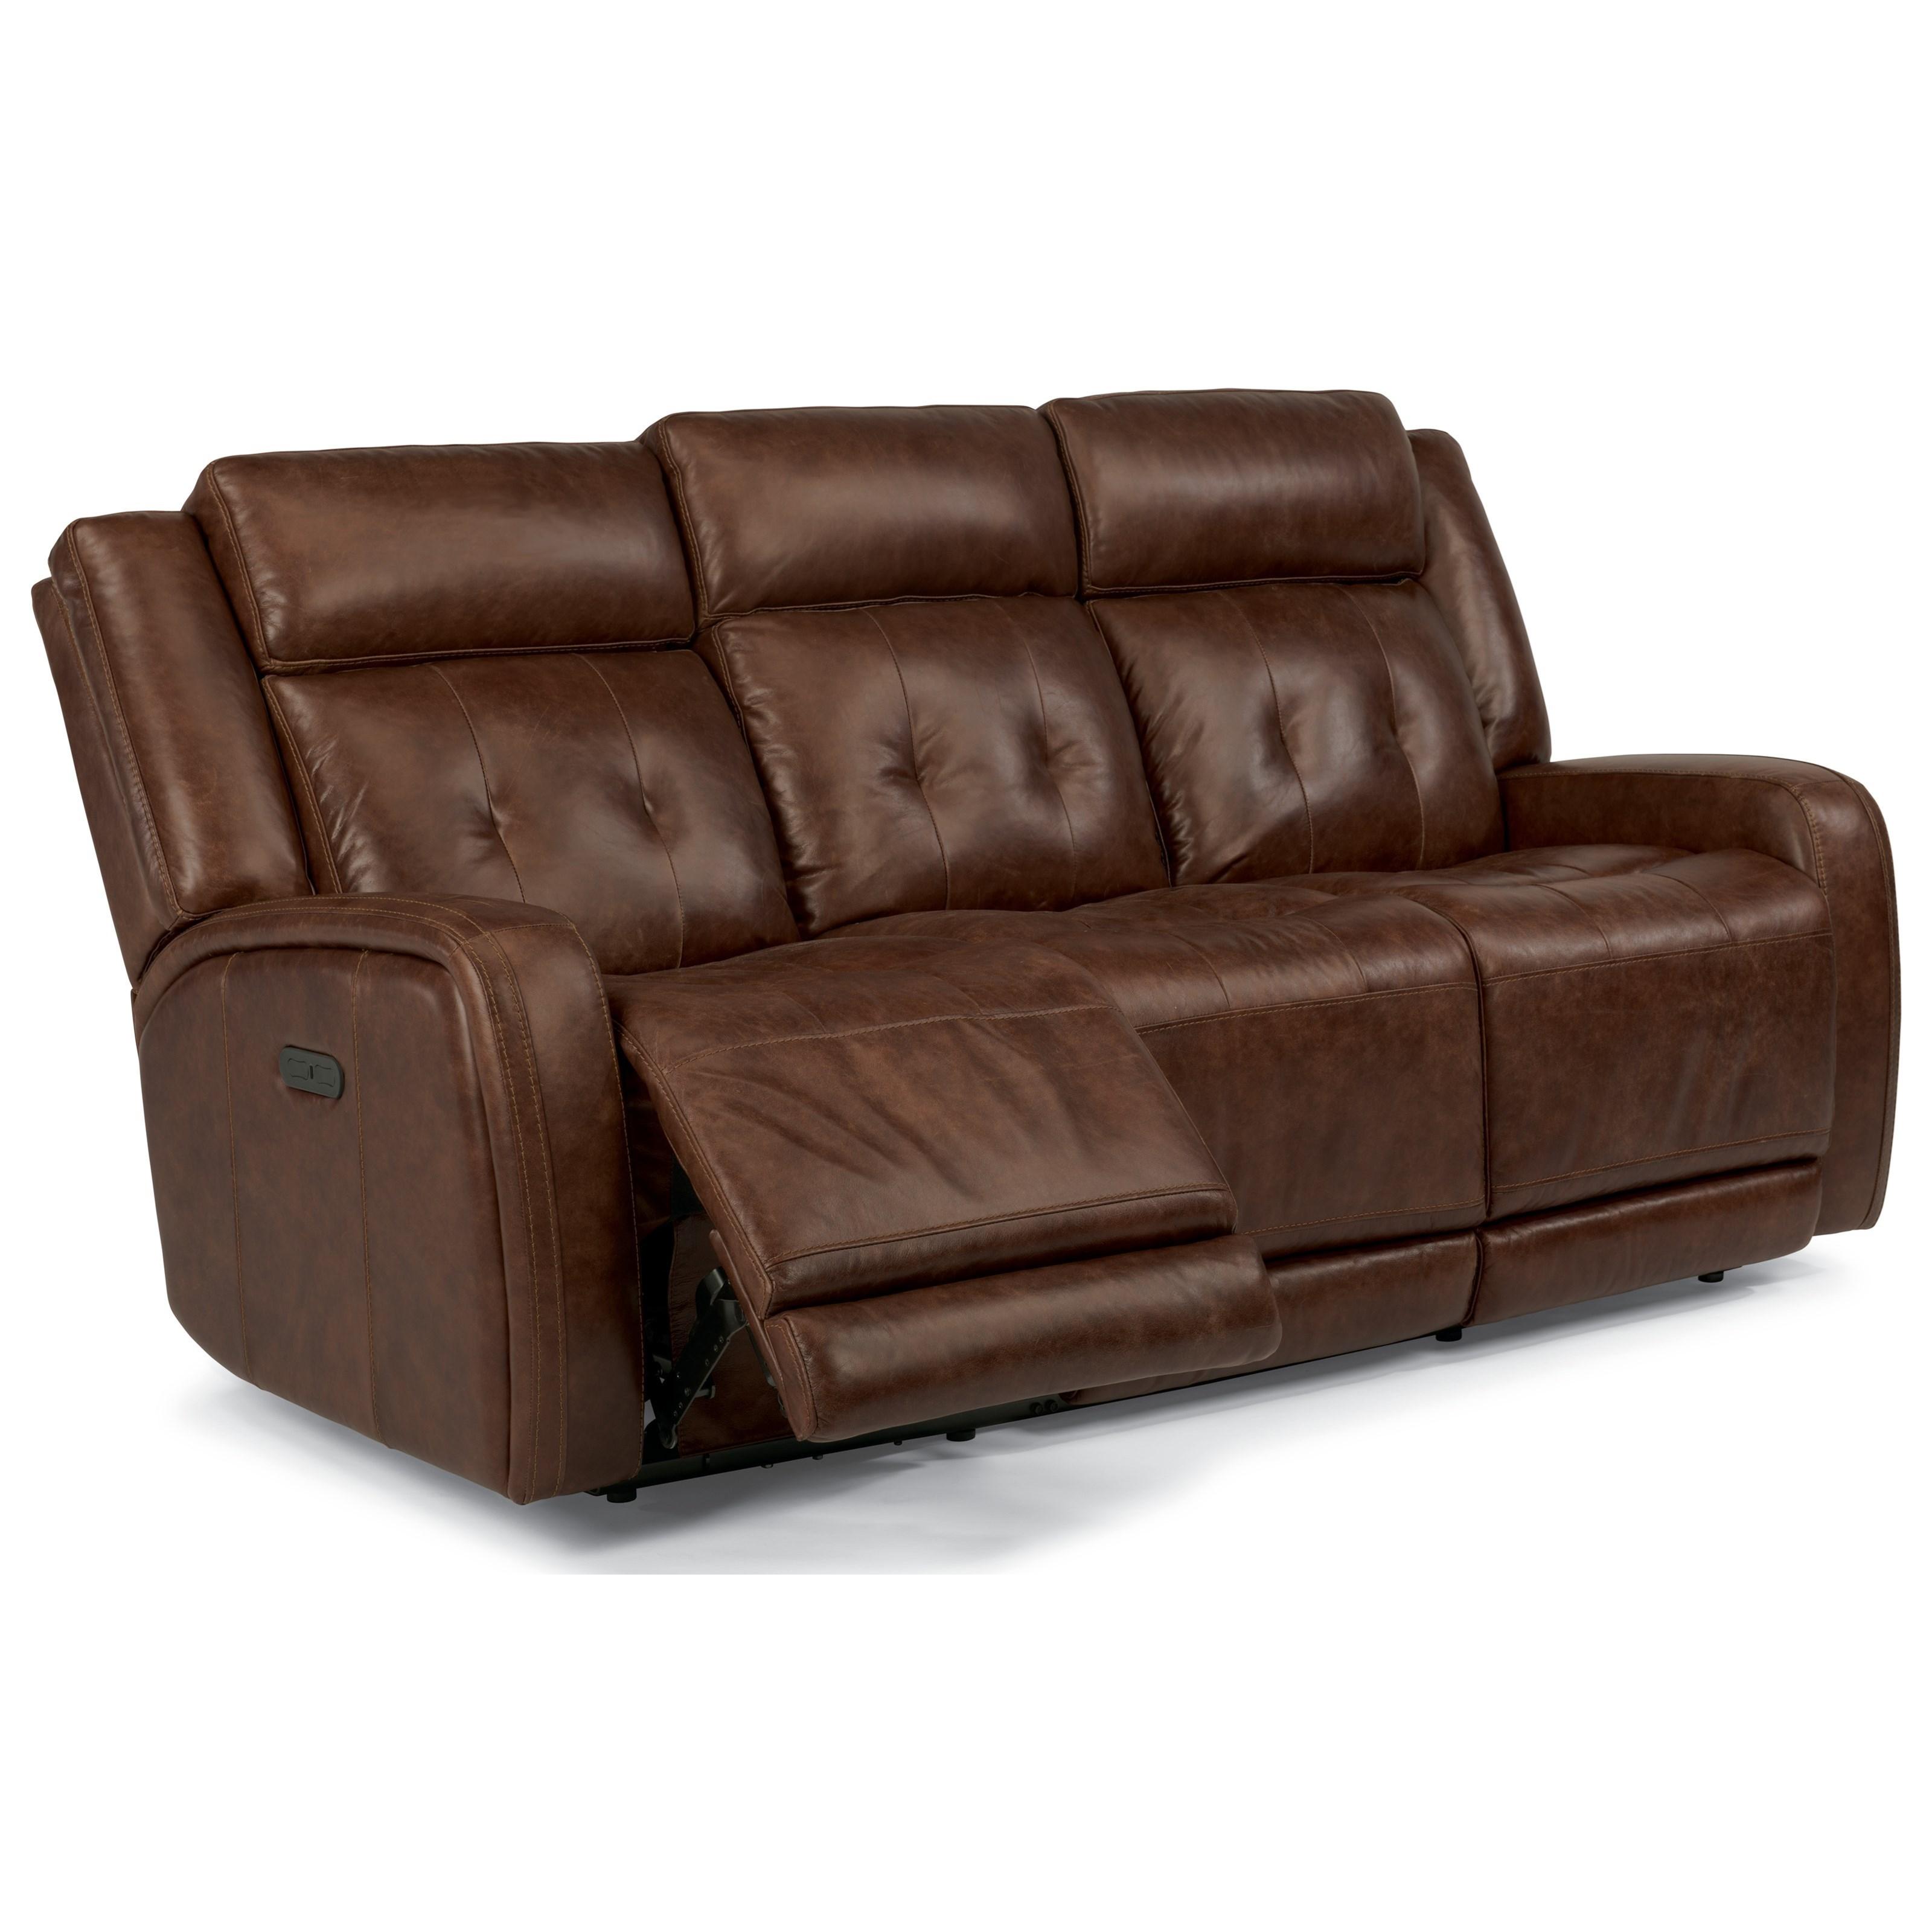 Flexsteel Latitudes Jude Power Reclining Sofa with Adjustable